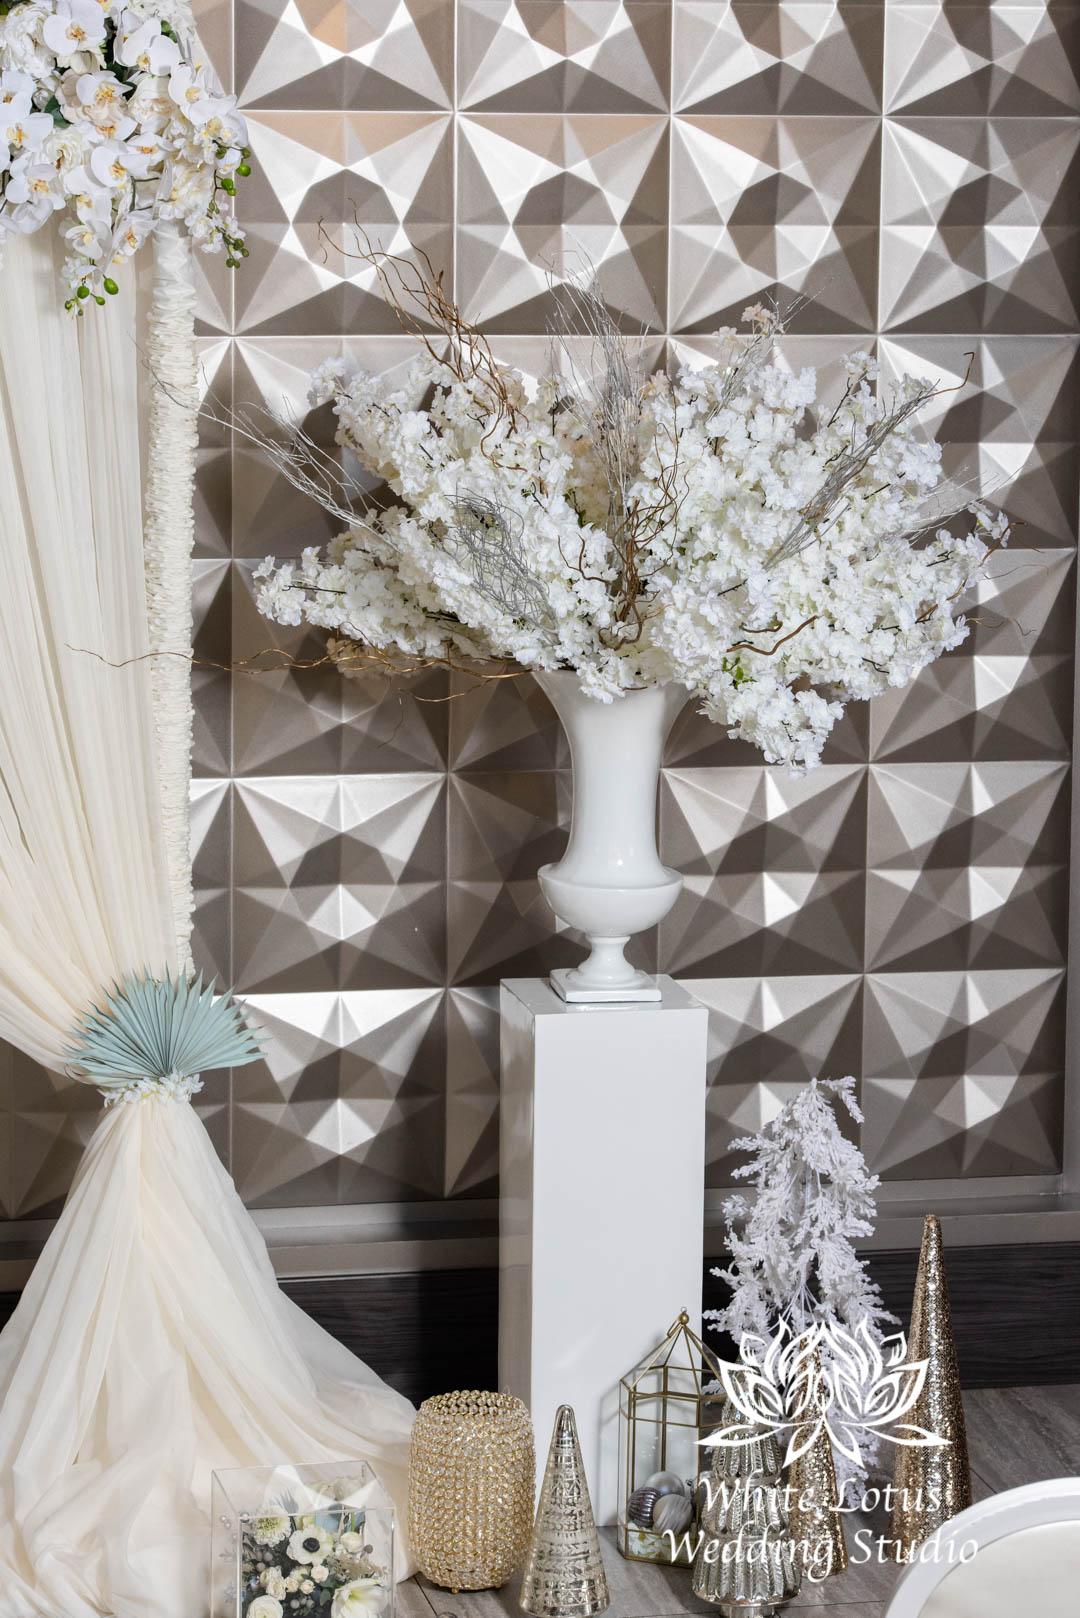 021- GLAM WINTERLUXE WEDDING INSPIRATION